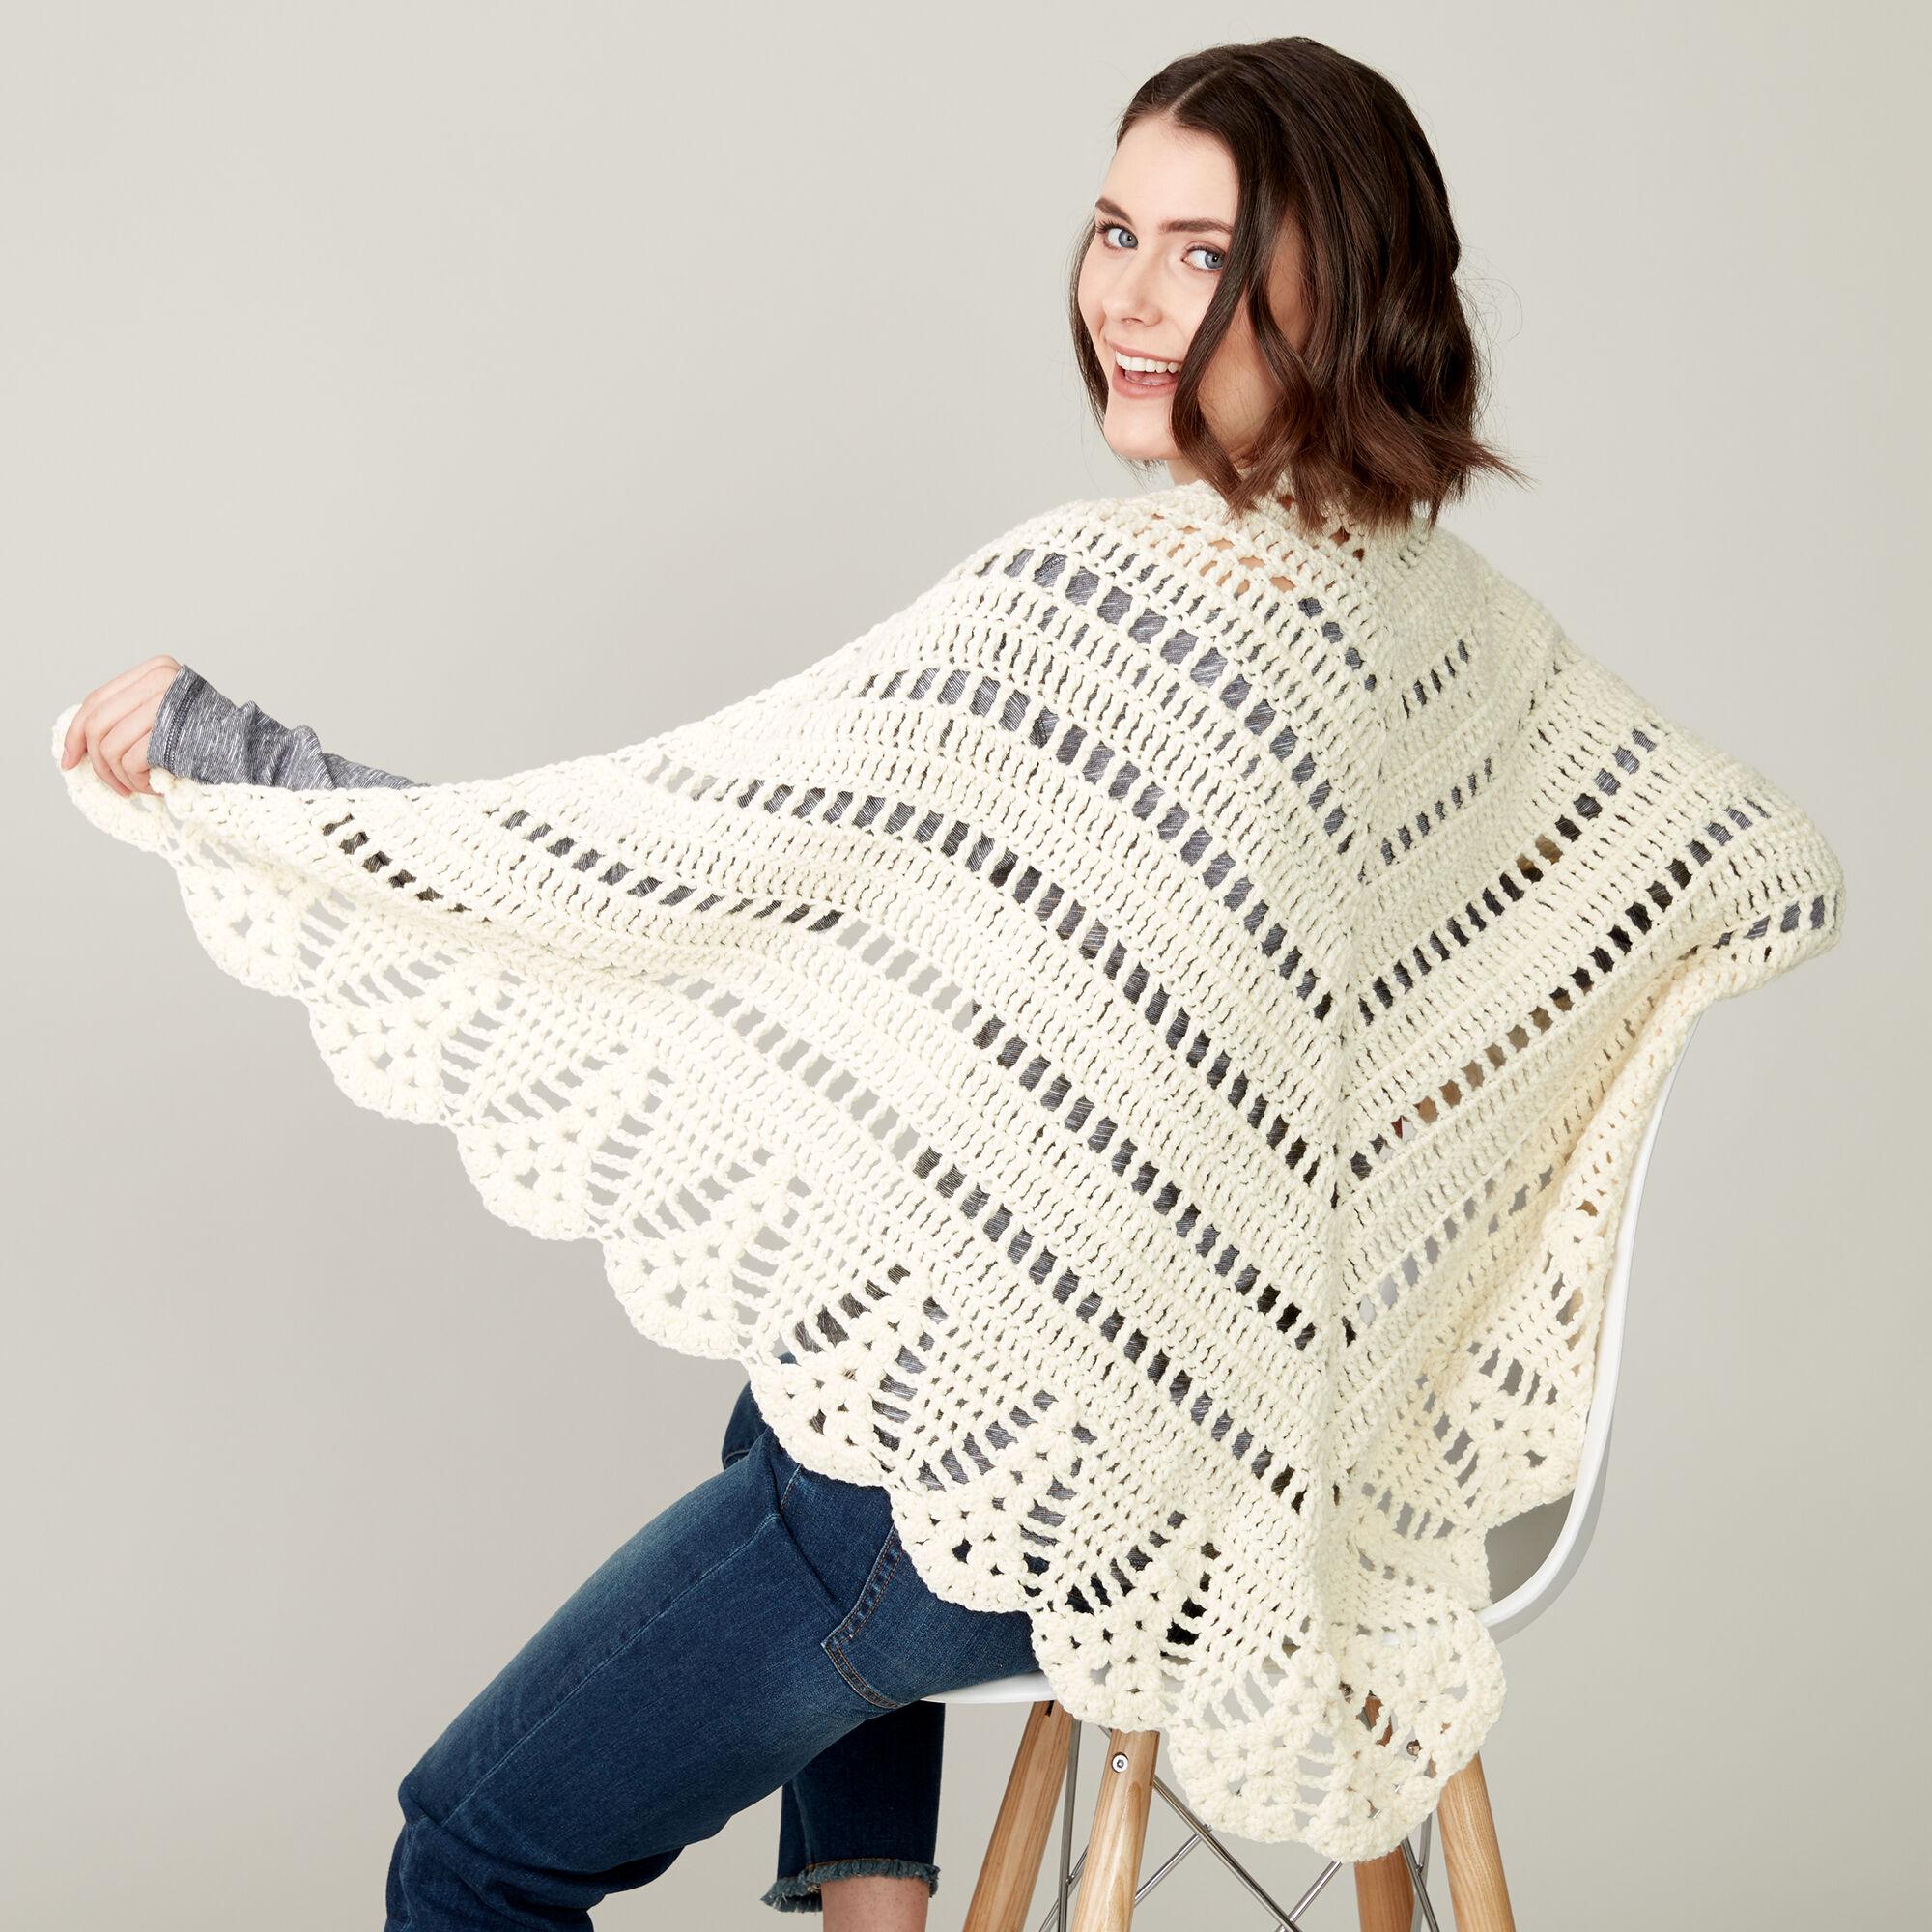 Caron Crochet Prayer Shawl Pattern Yarnspirations